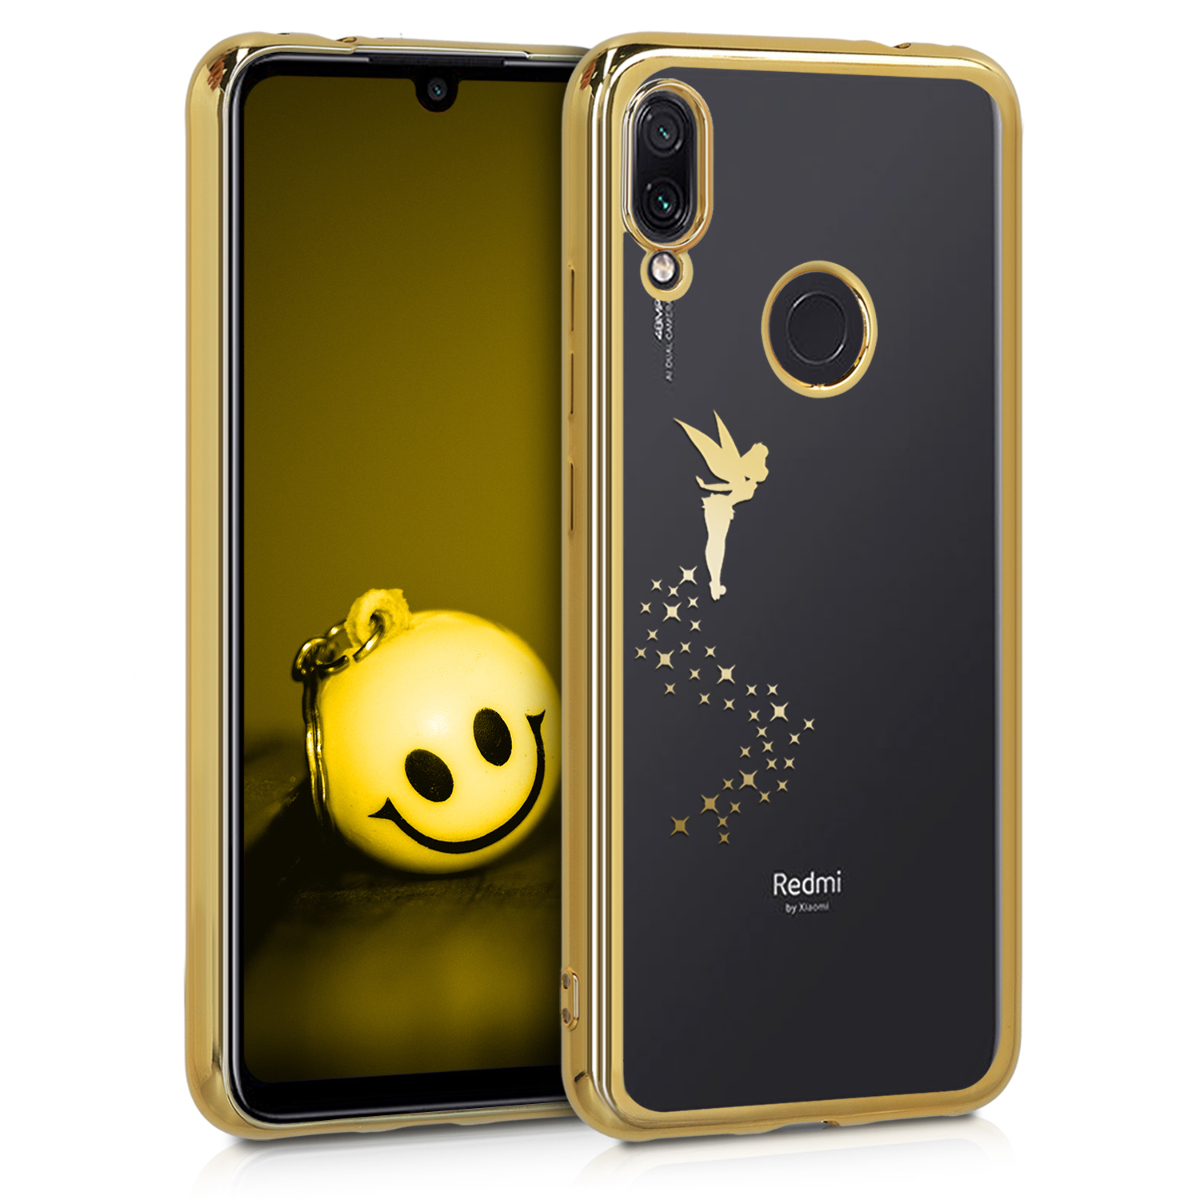 KW Θήκη Σιλικόνης Xiaomi Redmi Note 7 / Note 7 Pro - Gold / Transparent (49535.02)